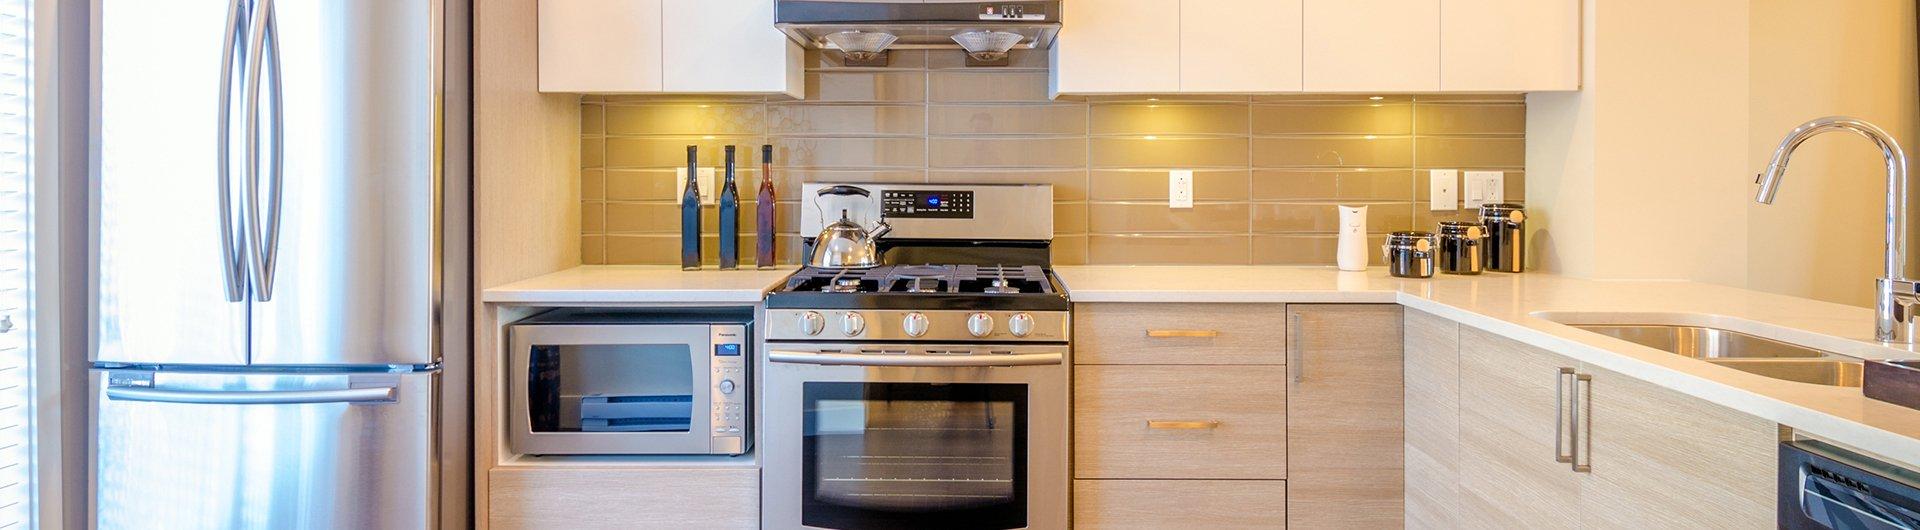 Kitchen refurbishments